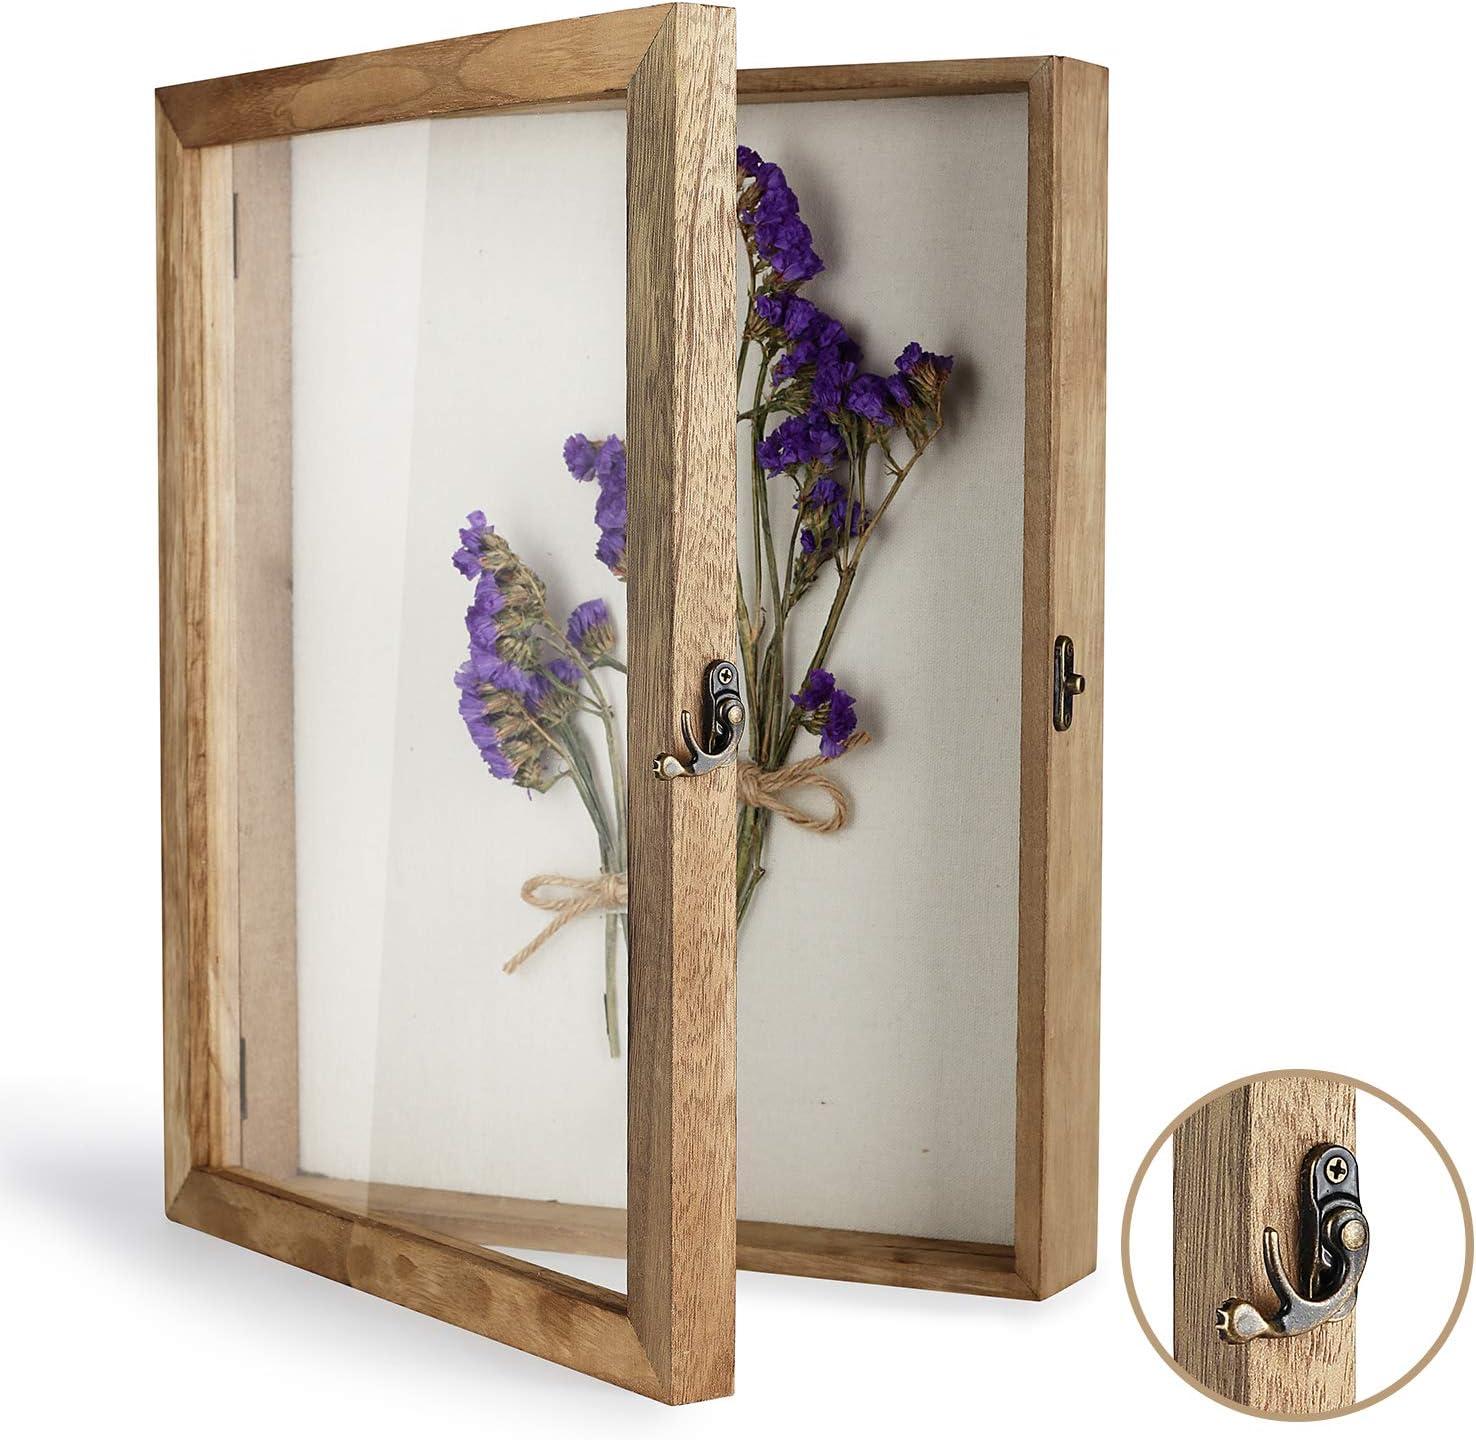 "TJ.MOREE Shadow Box Display Case 11"" x 14"" Shadowbox Frame with Linen Back Memorabilia Bouquet Medals Photos Memory Box for Keepsakes"